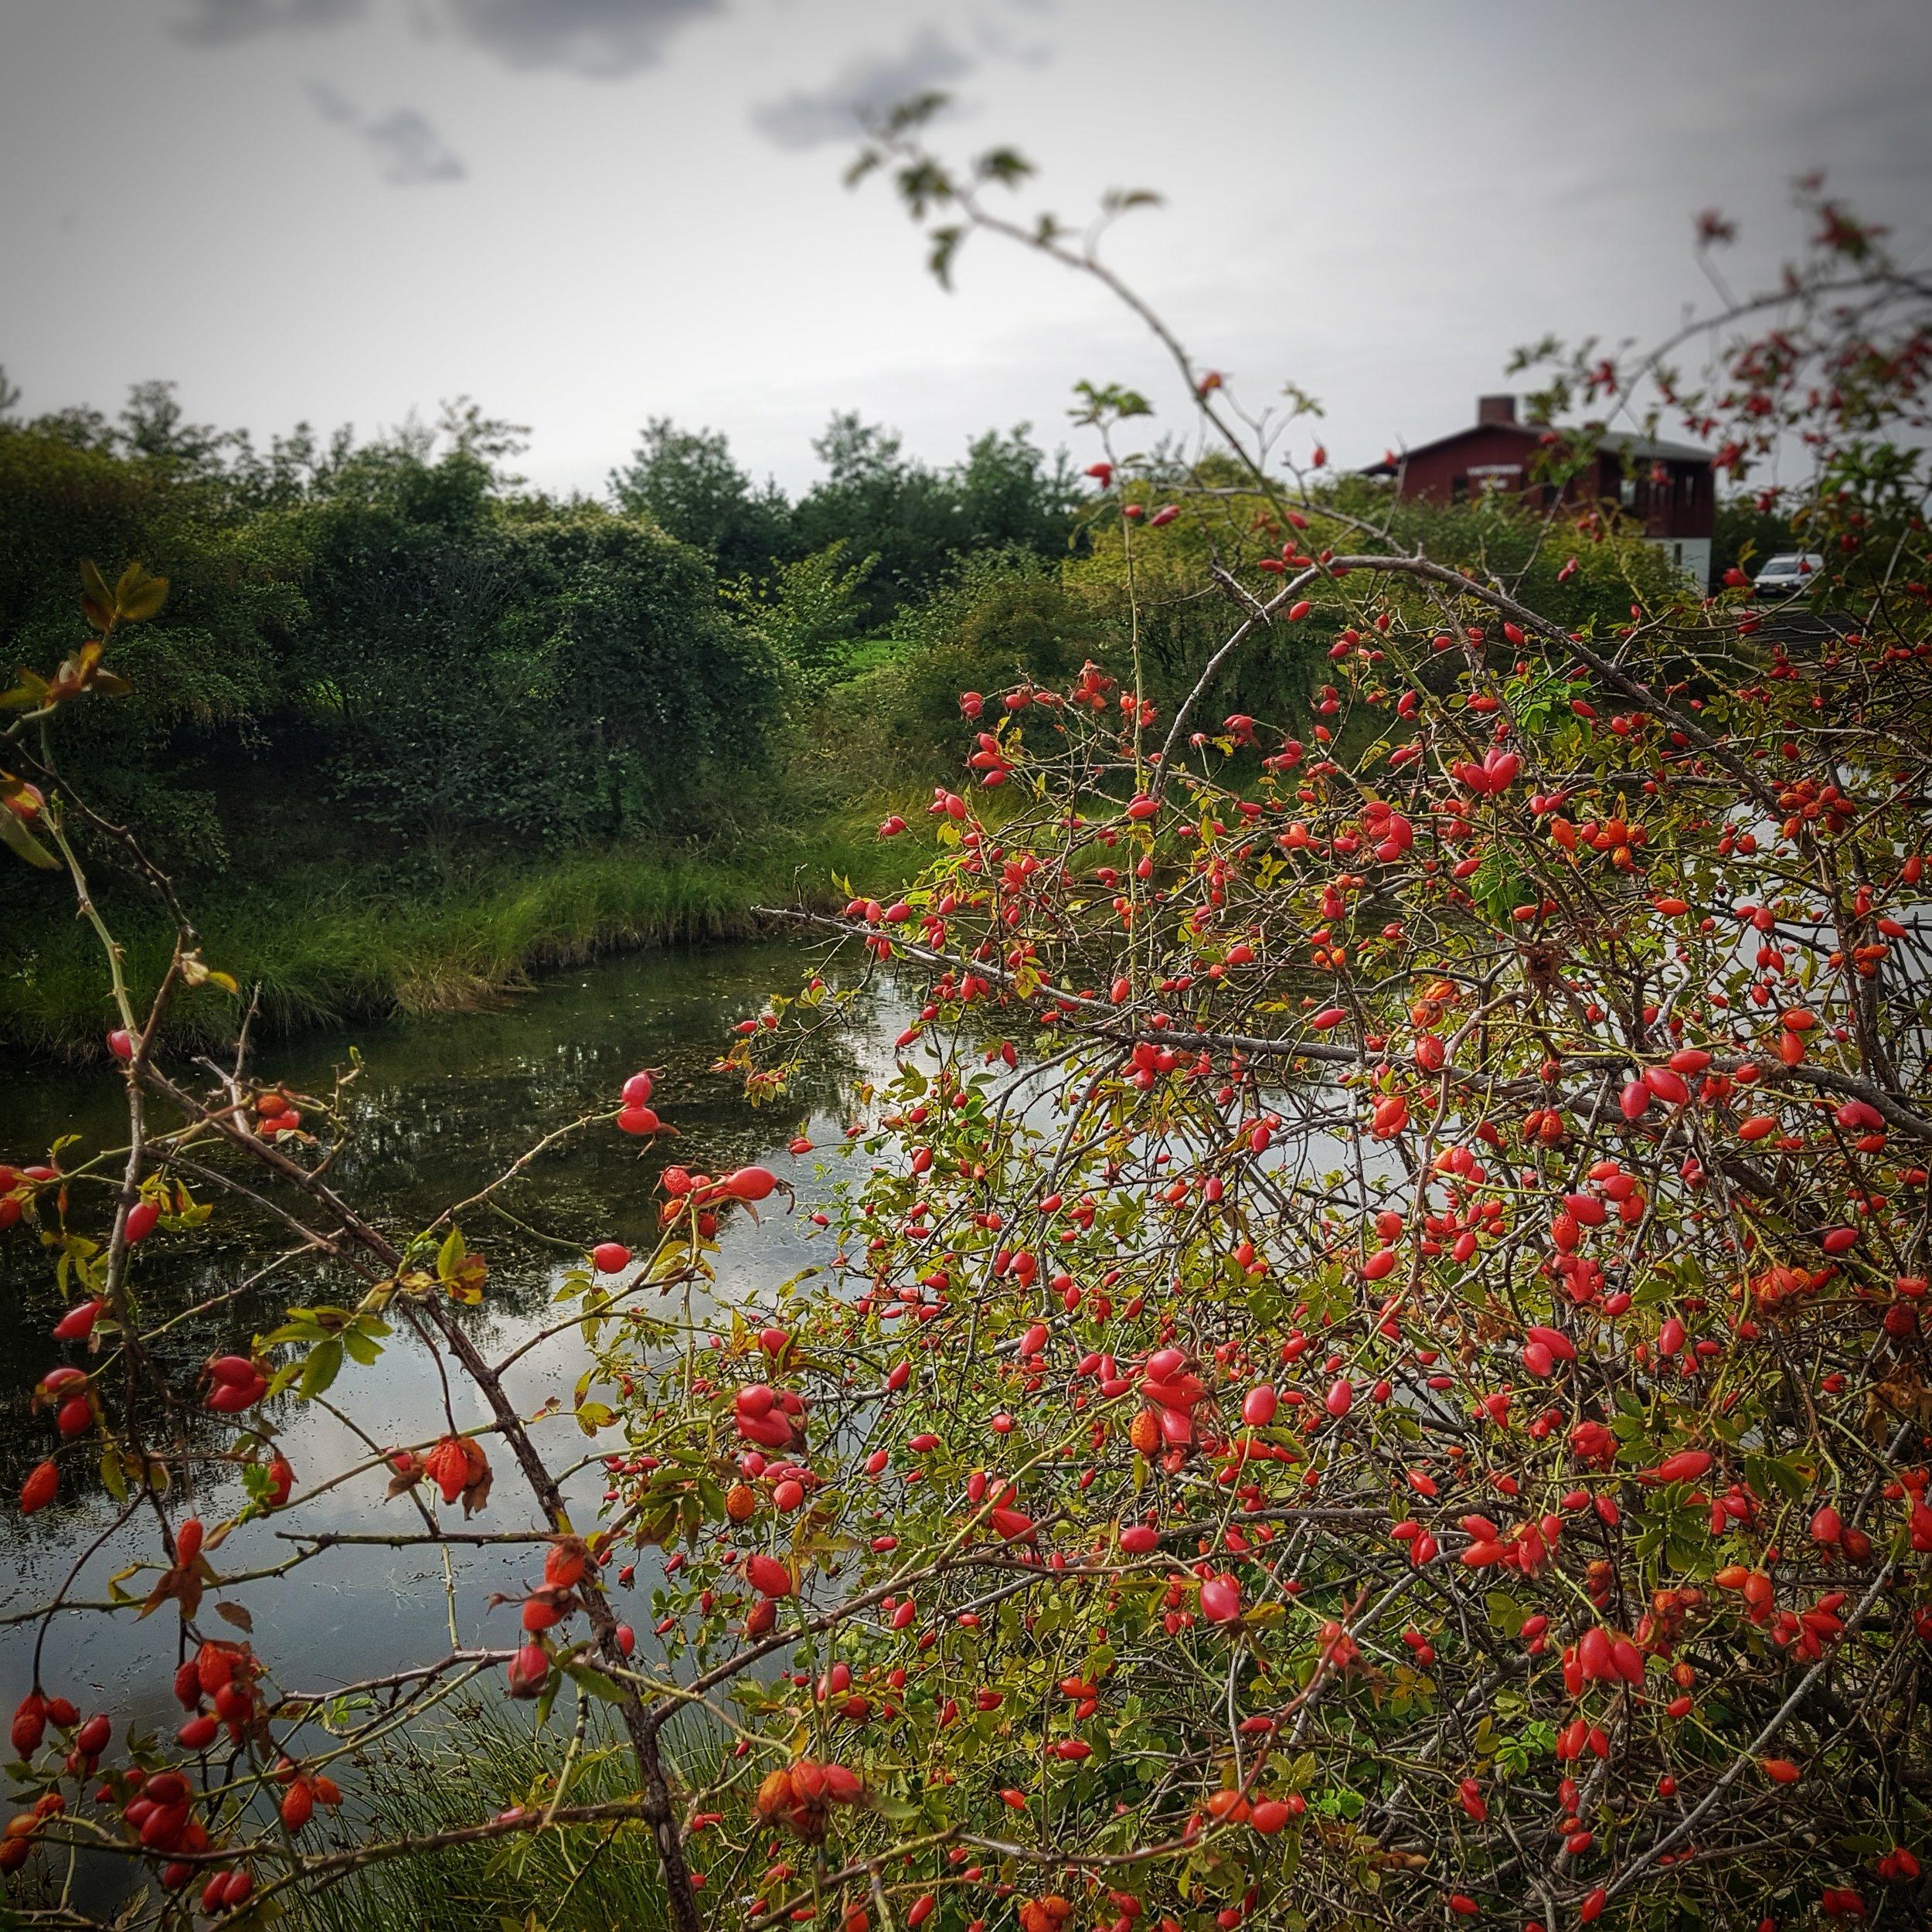 Day 243 - August 31: Berry abundance